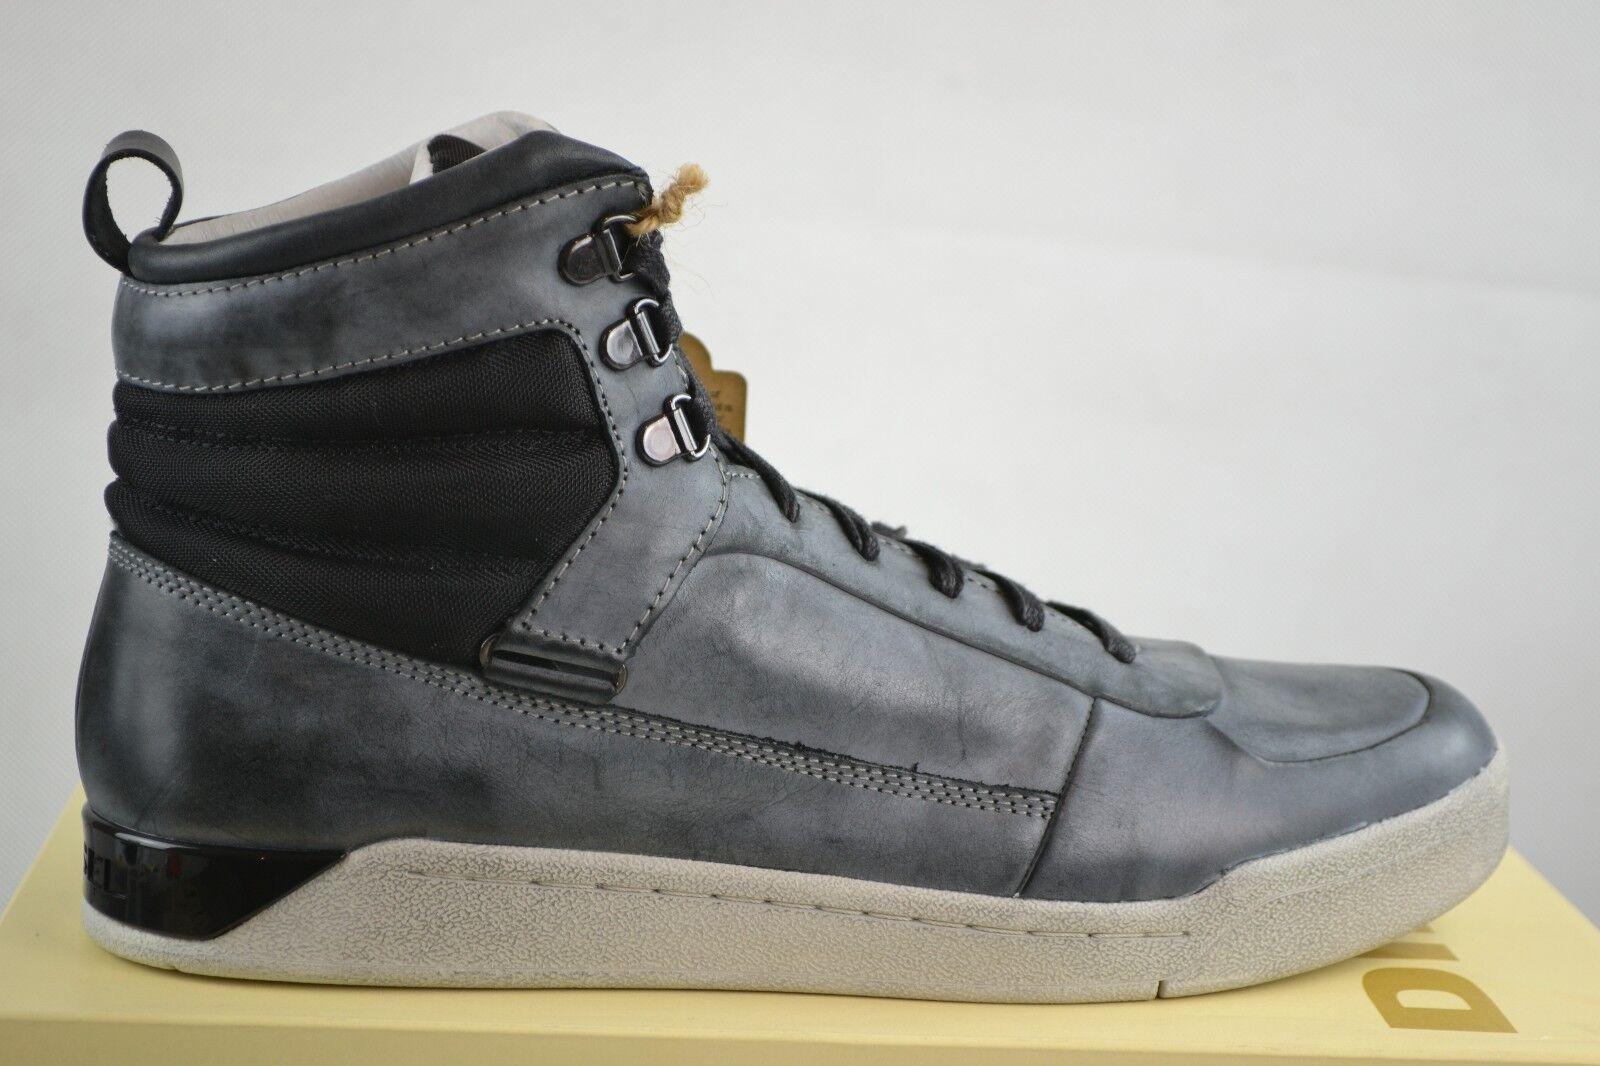 Diesel Onice grey black Leder Leather Shoes Schuhe Sneakers